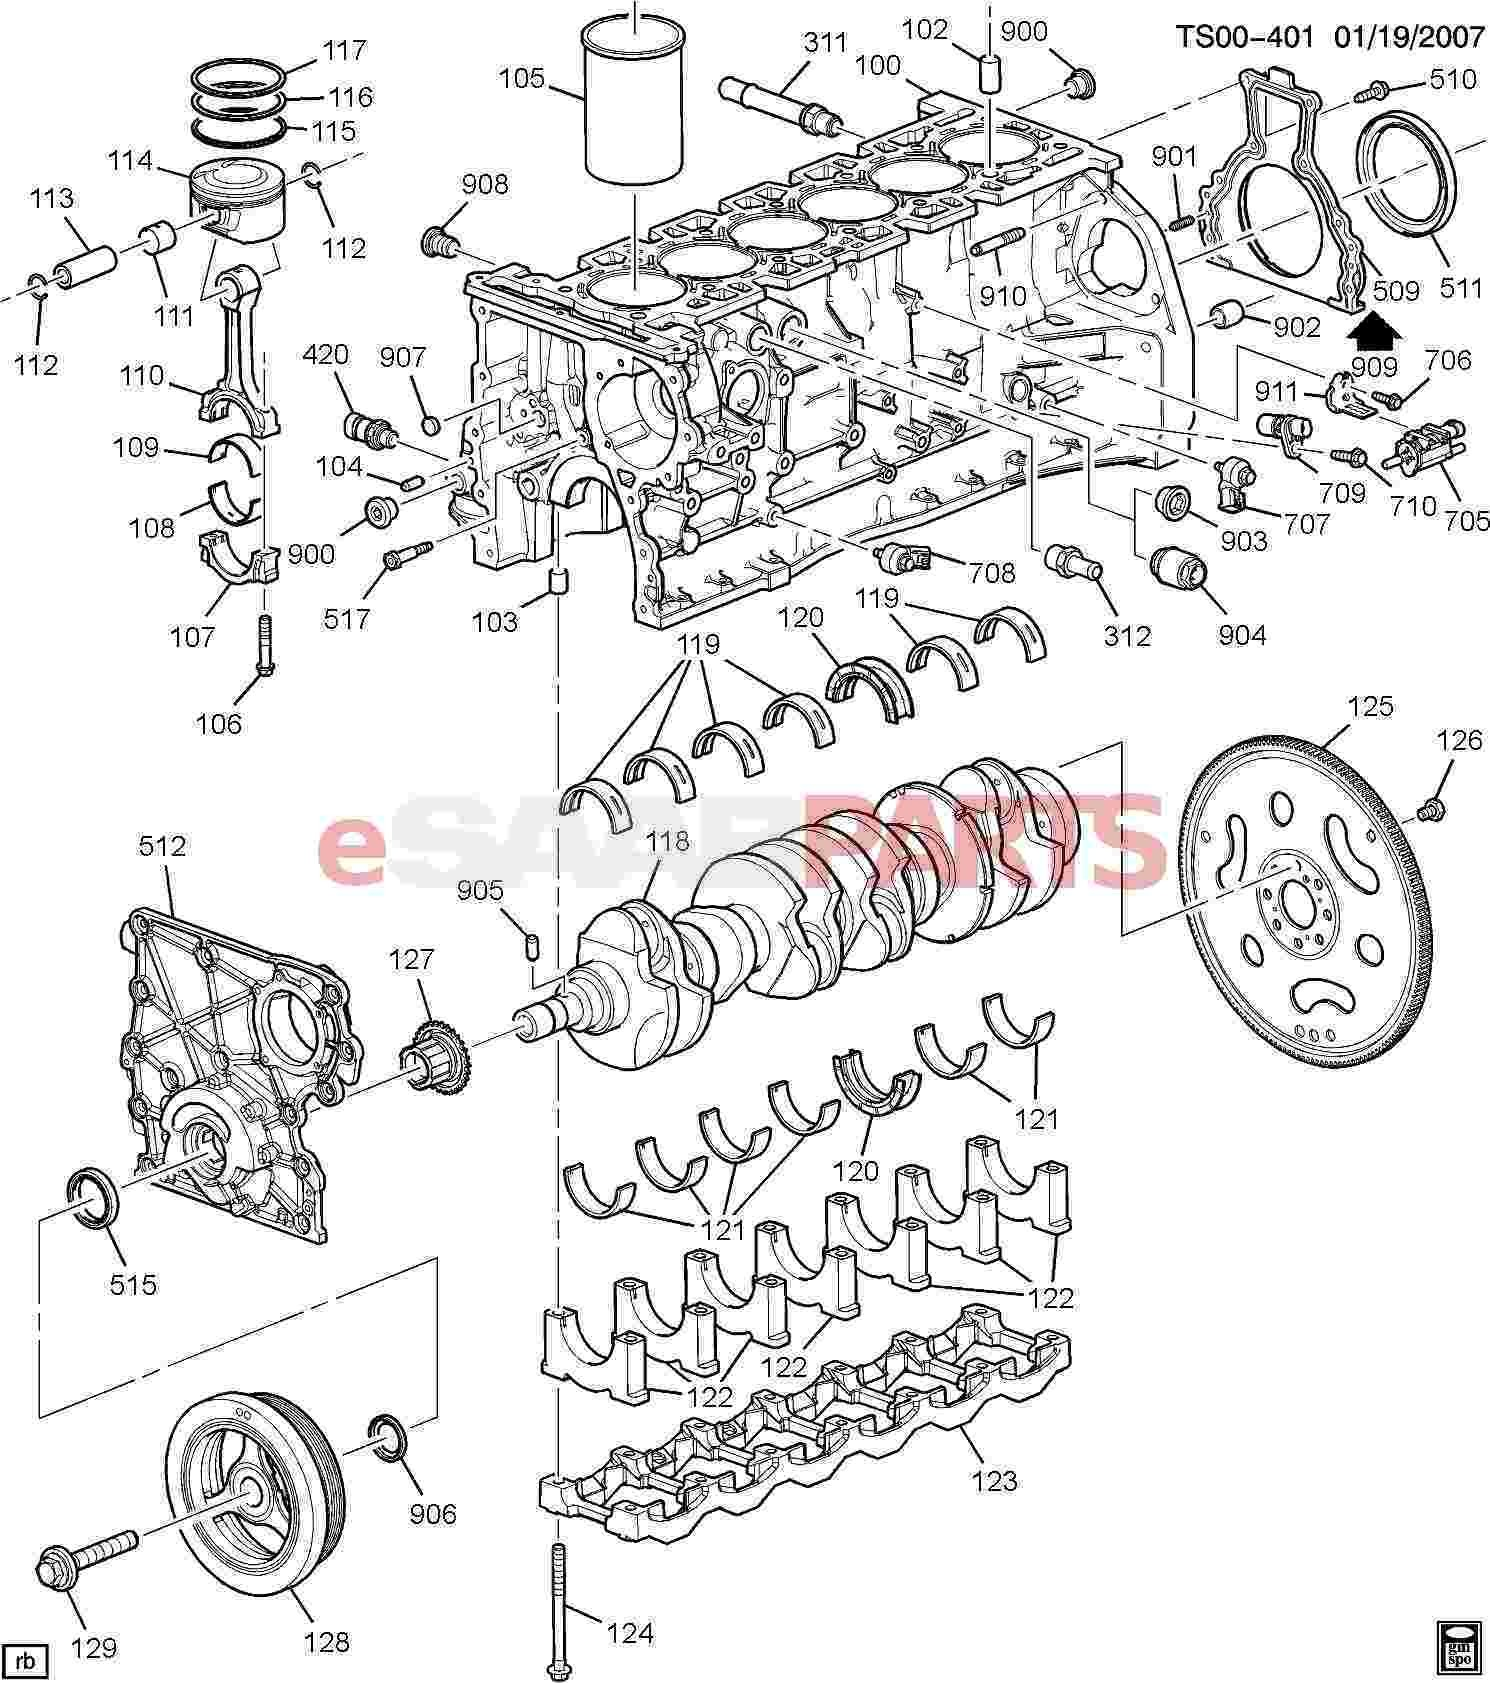 Auto Engine Parts Diagram ] Saab Plug M16x1 5×14 24 Od society Automotive Of Auto Engine Parts Diagram